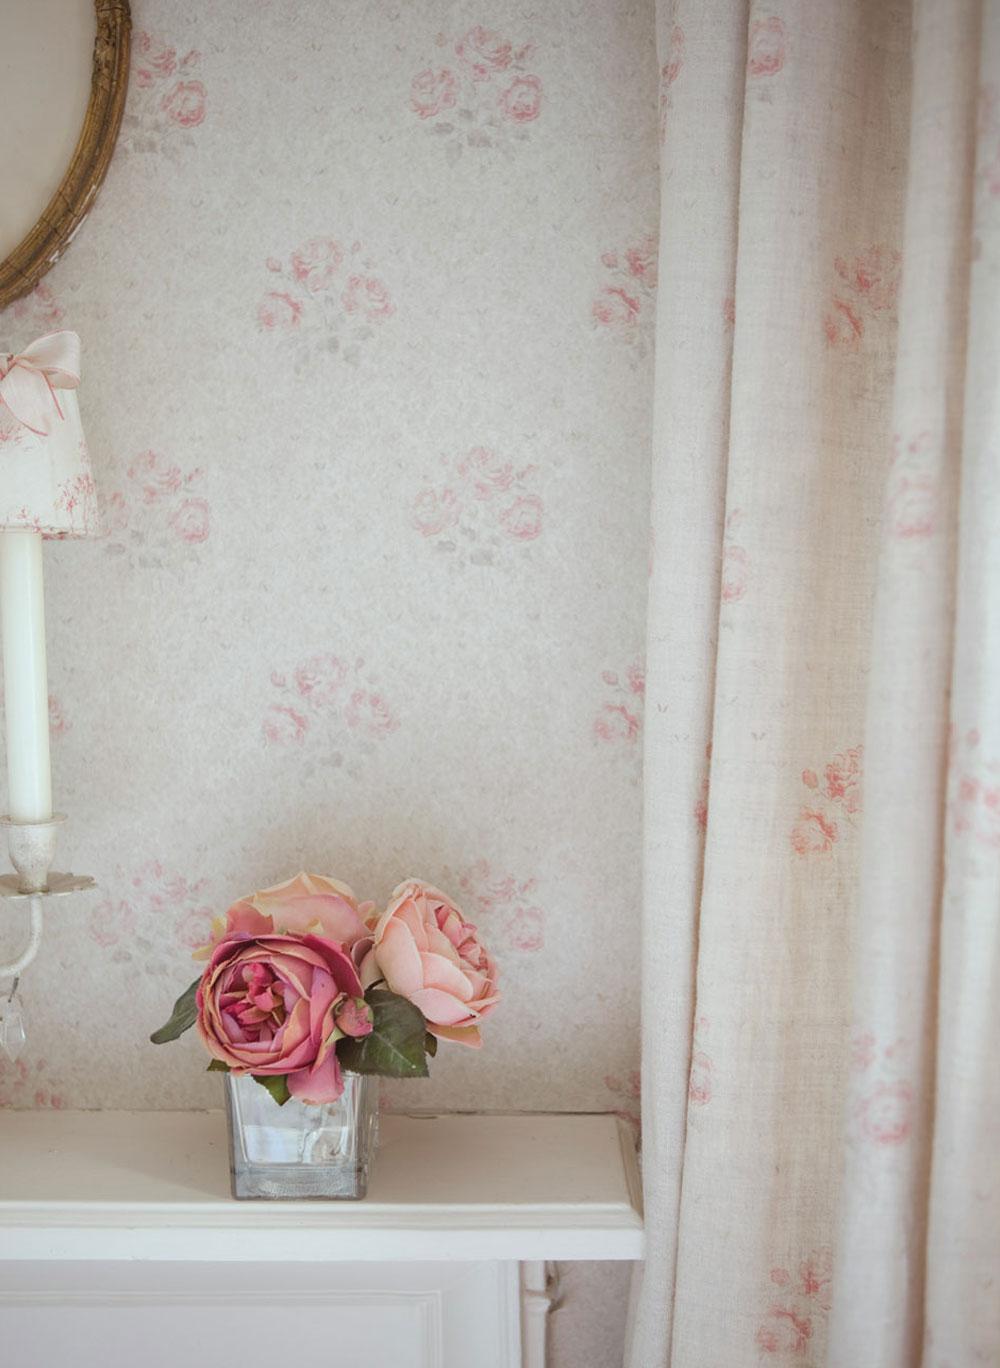 Kitty-Curtains-Close